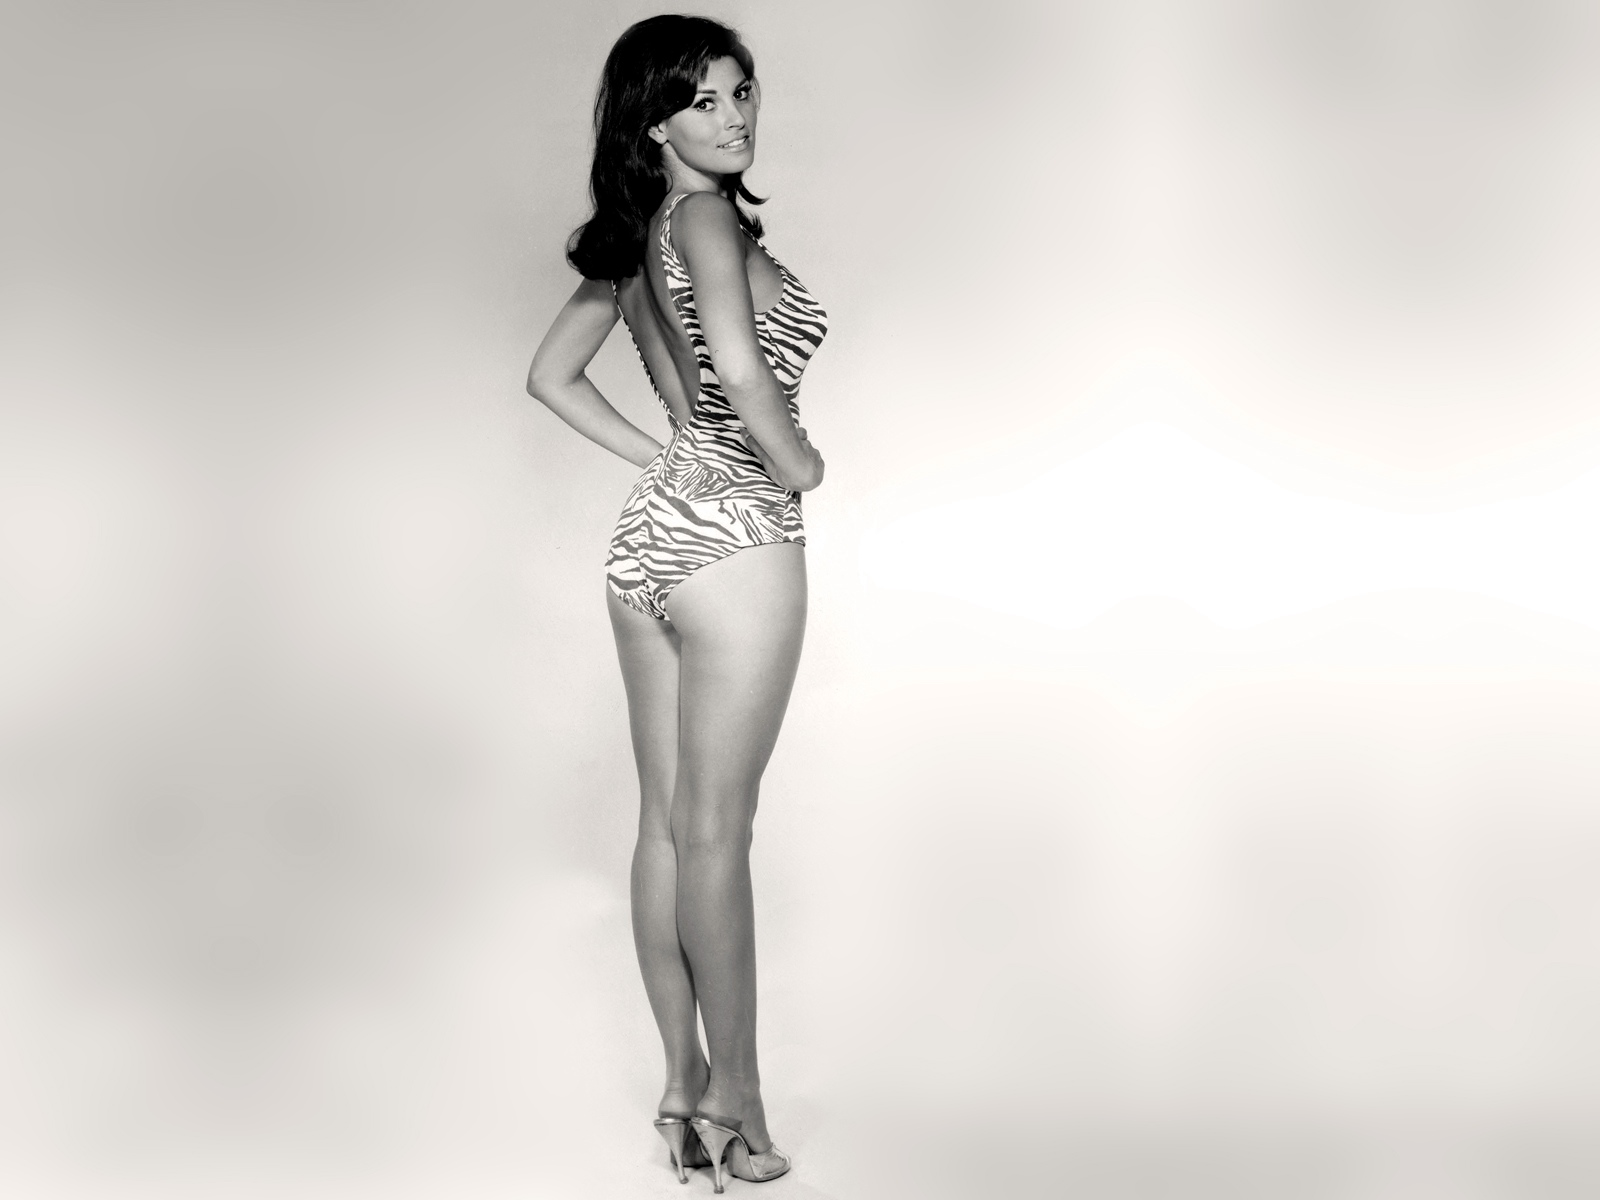 Raquel Welch - Photo Actress